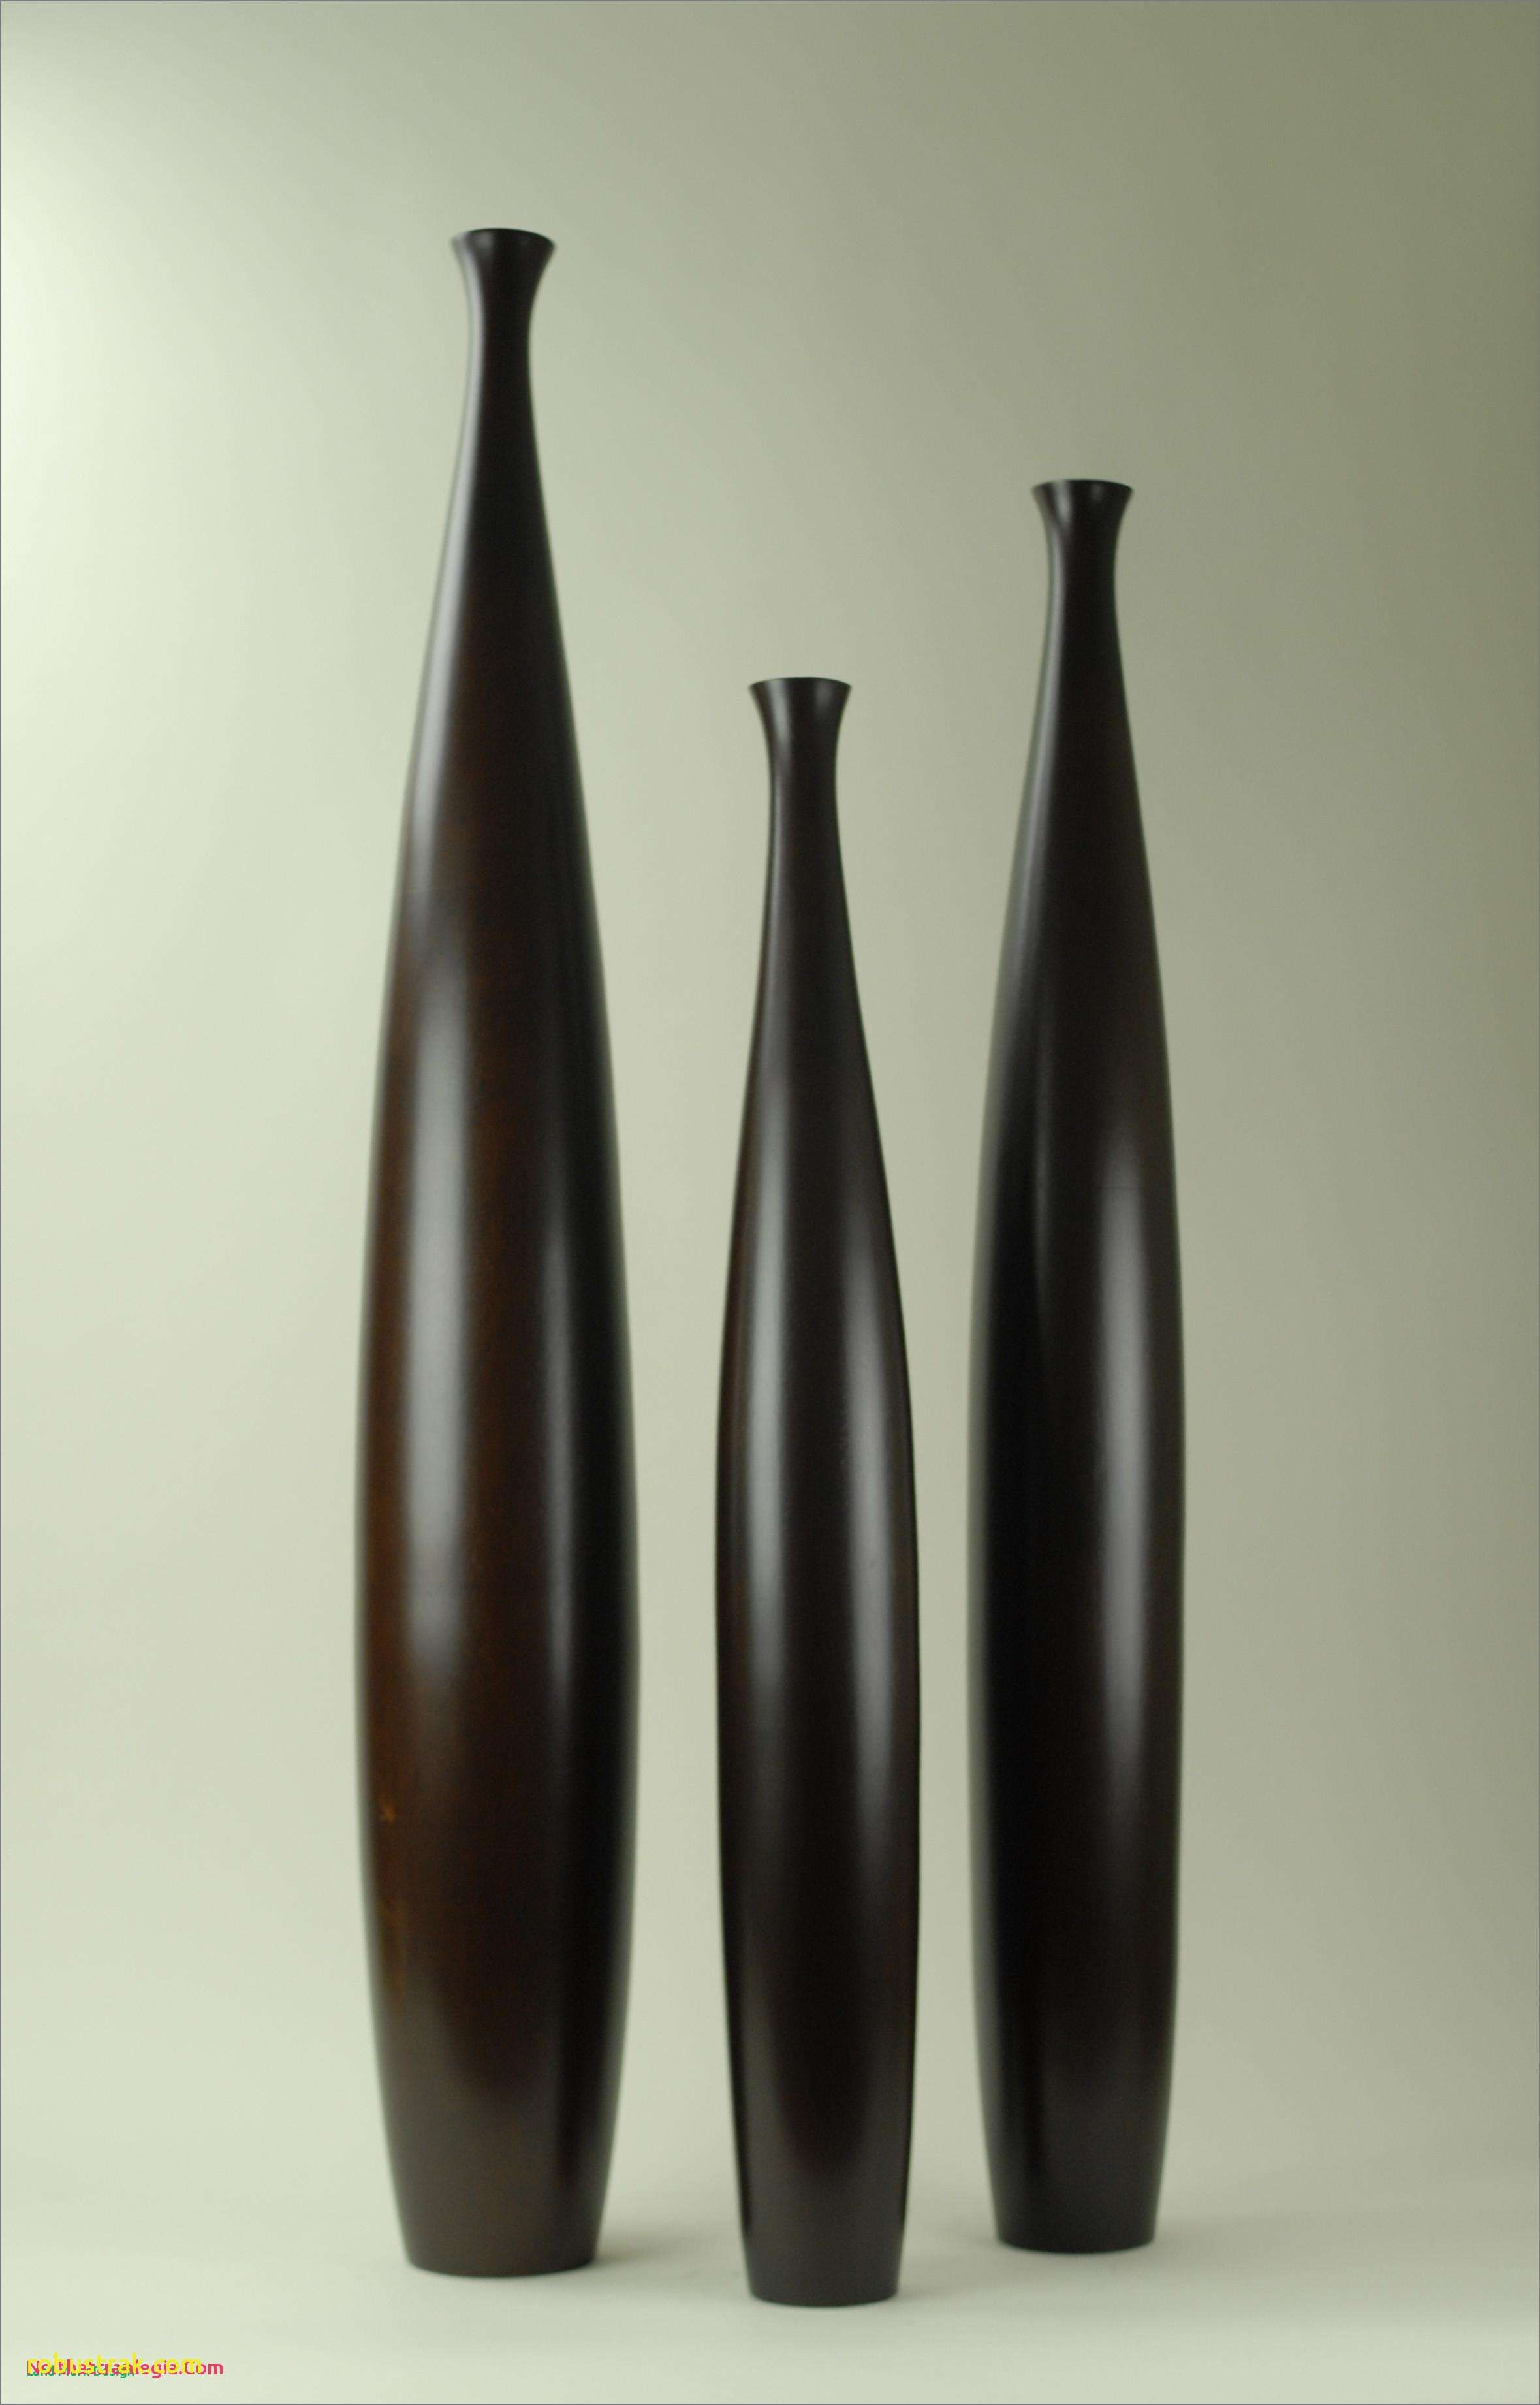 Inspirational Home Decor Floor Vases Floor Vase Contemporary